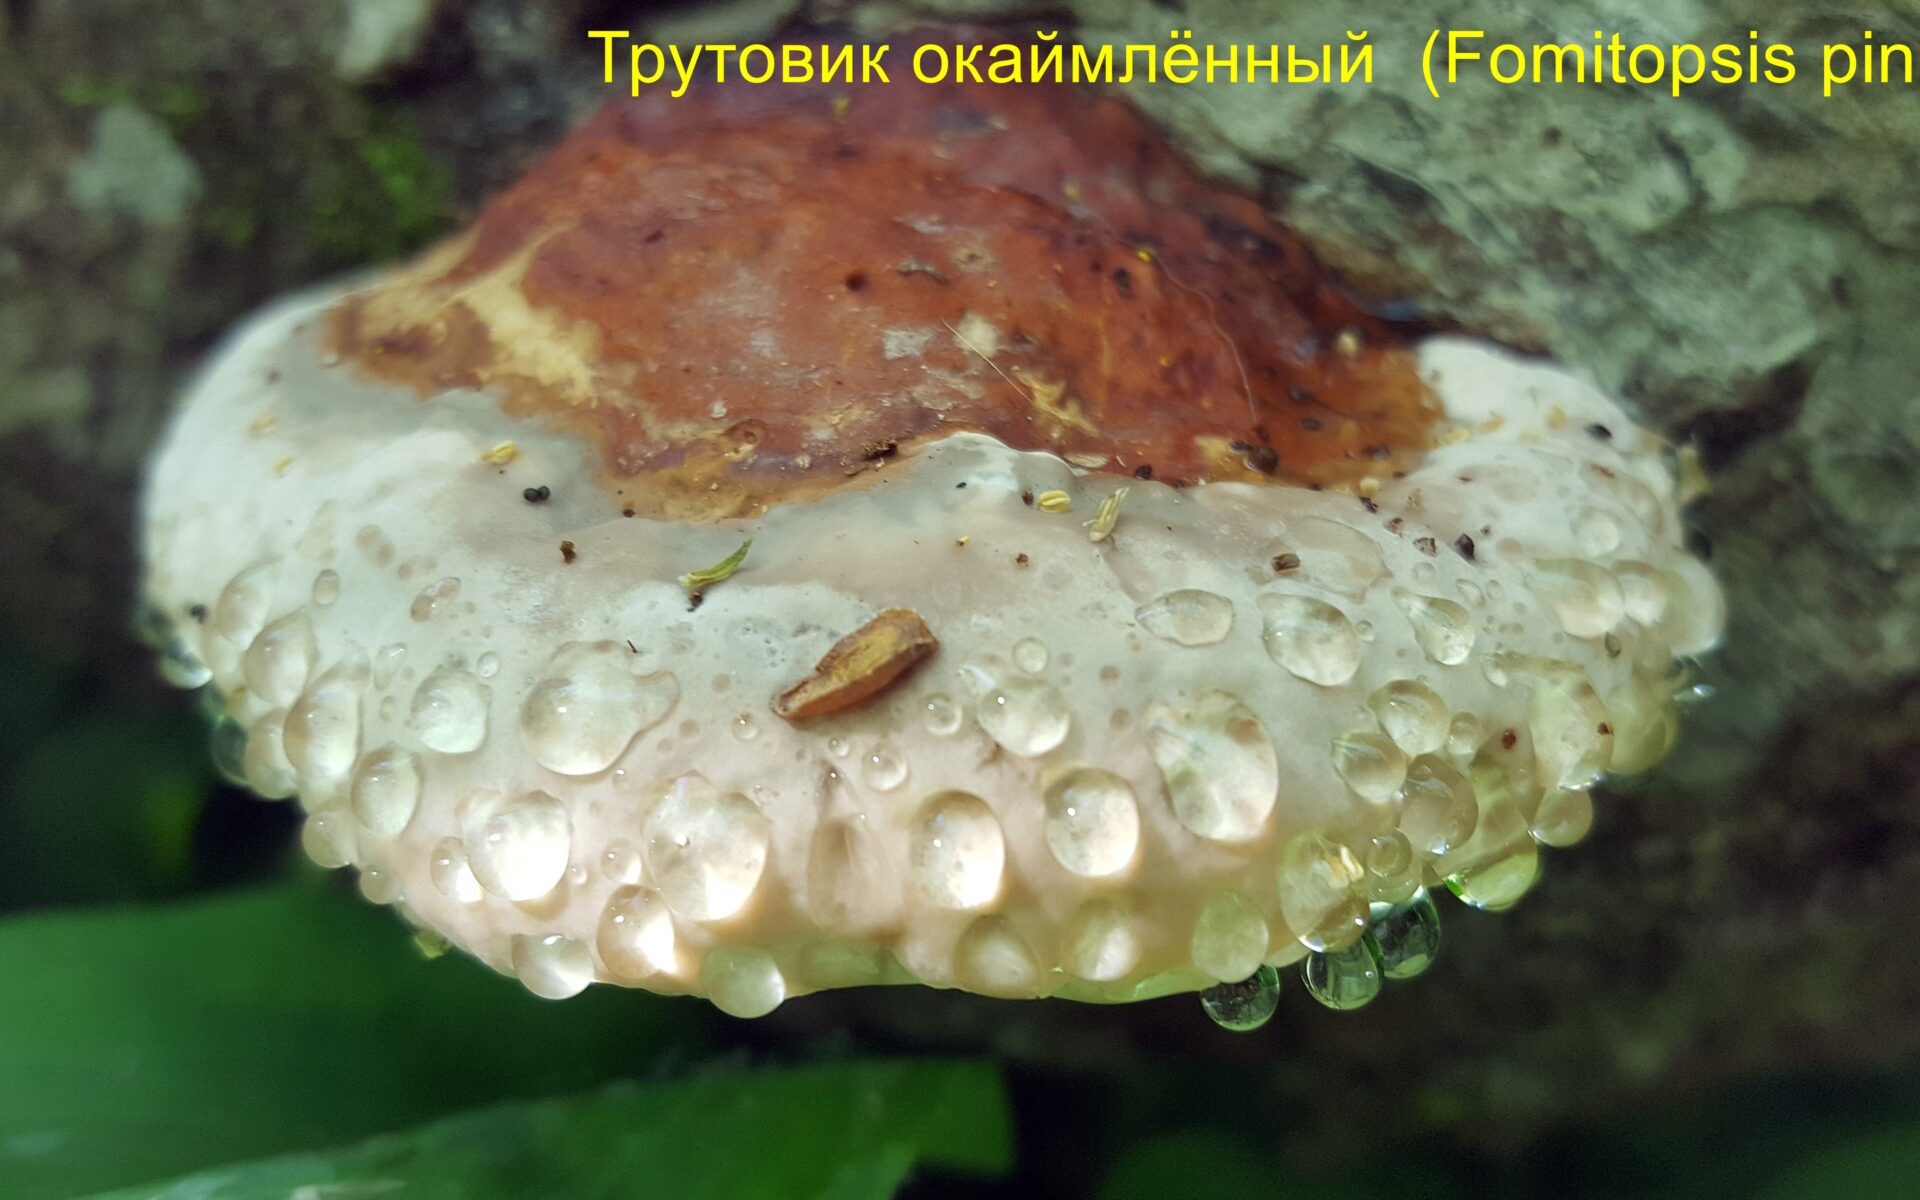 Трутовик окаймлённый Fomitopsis pinicola